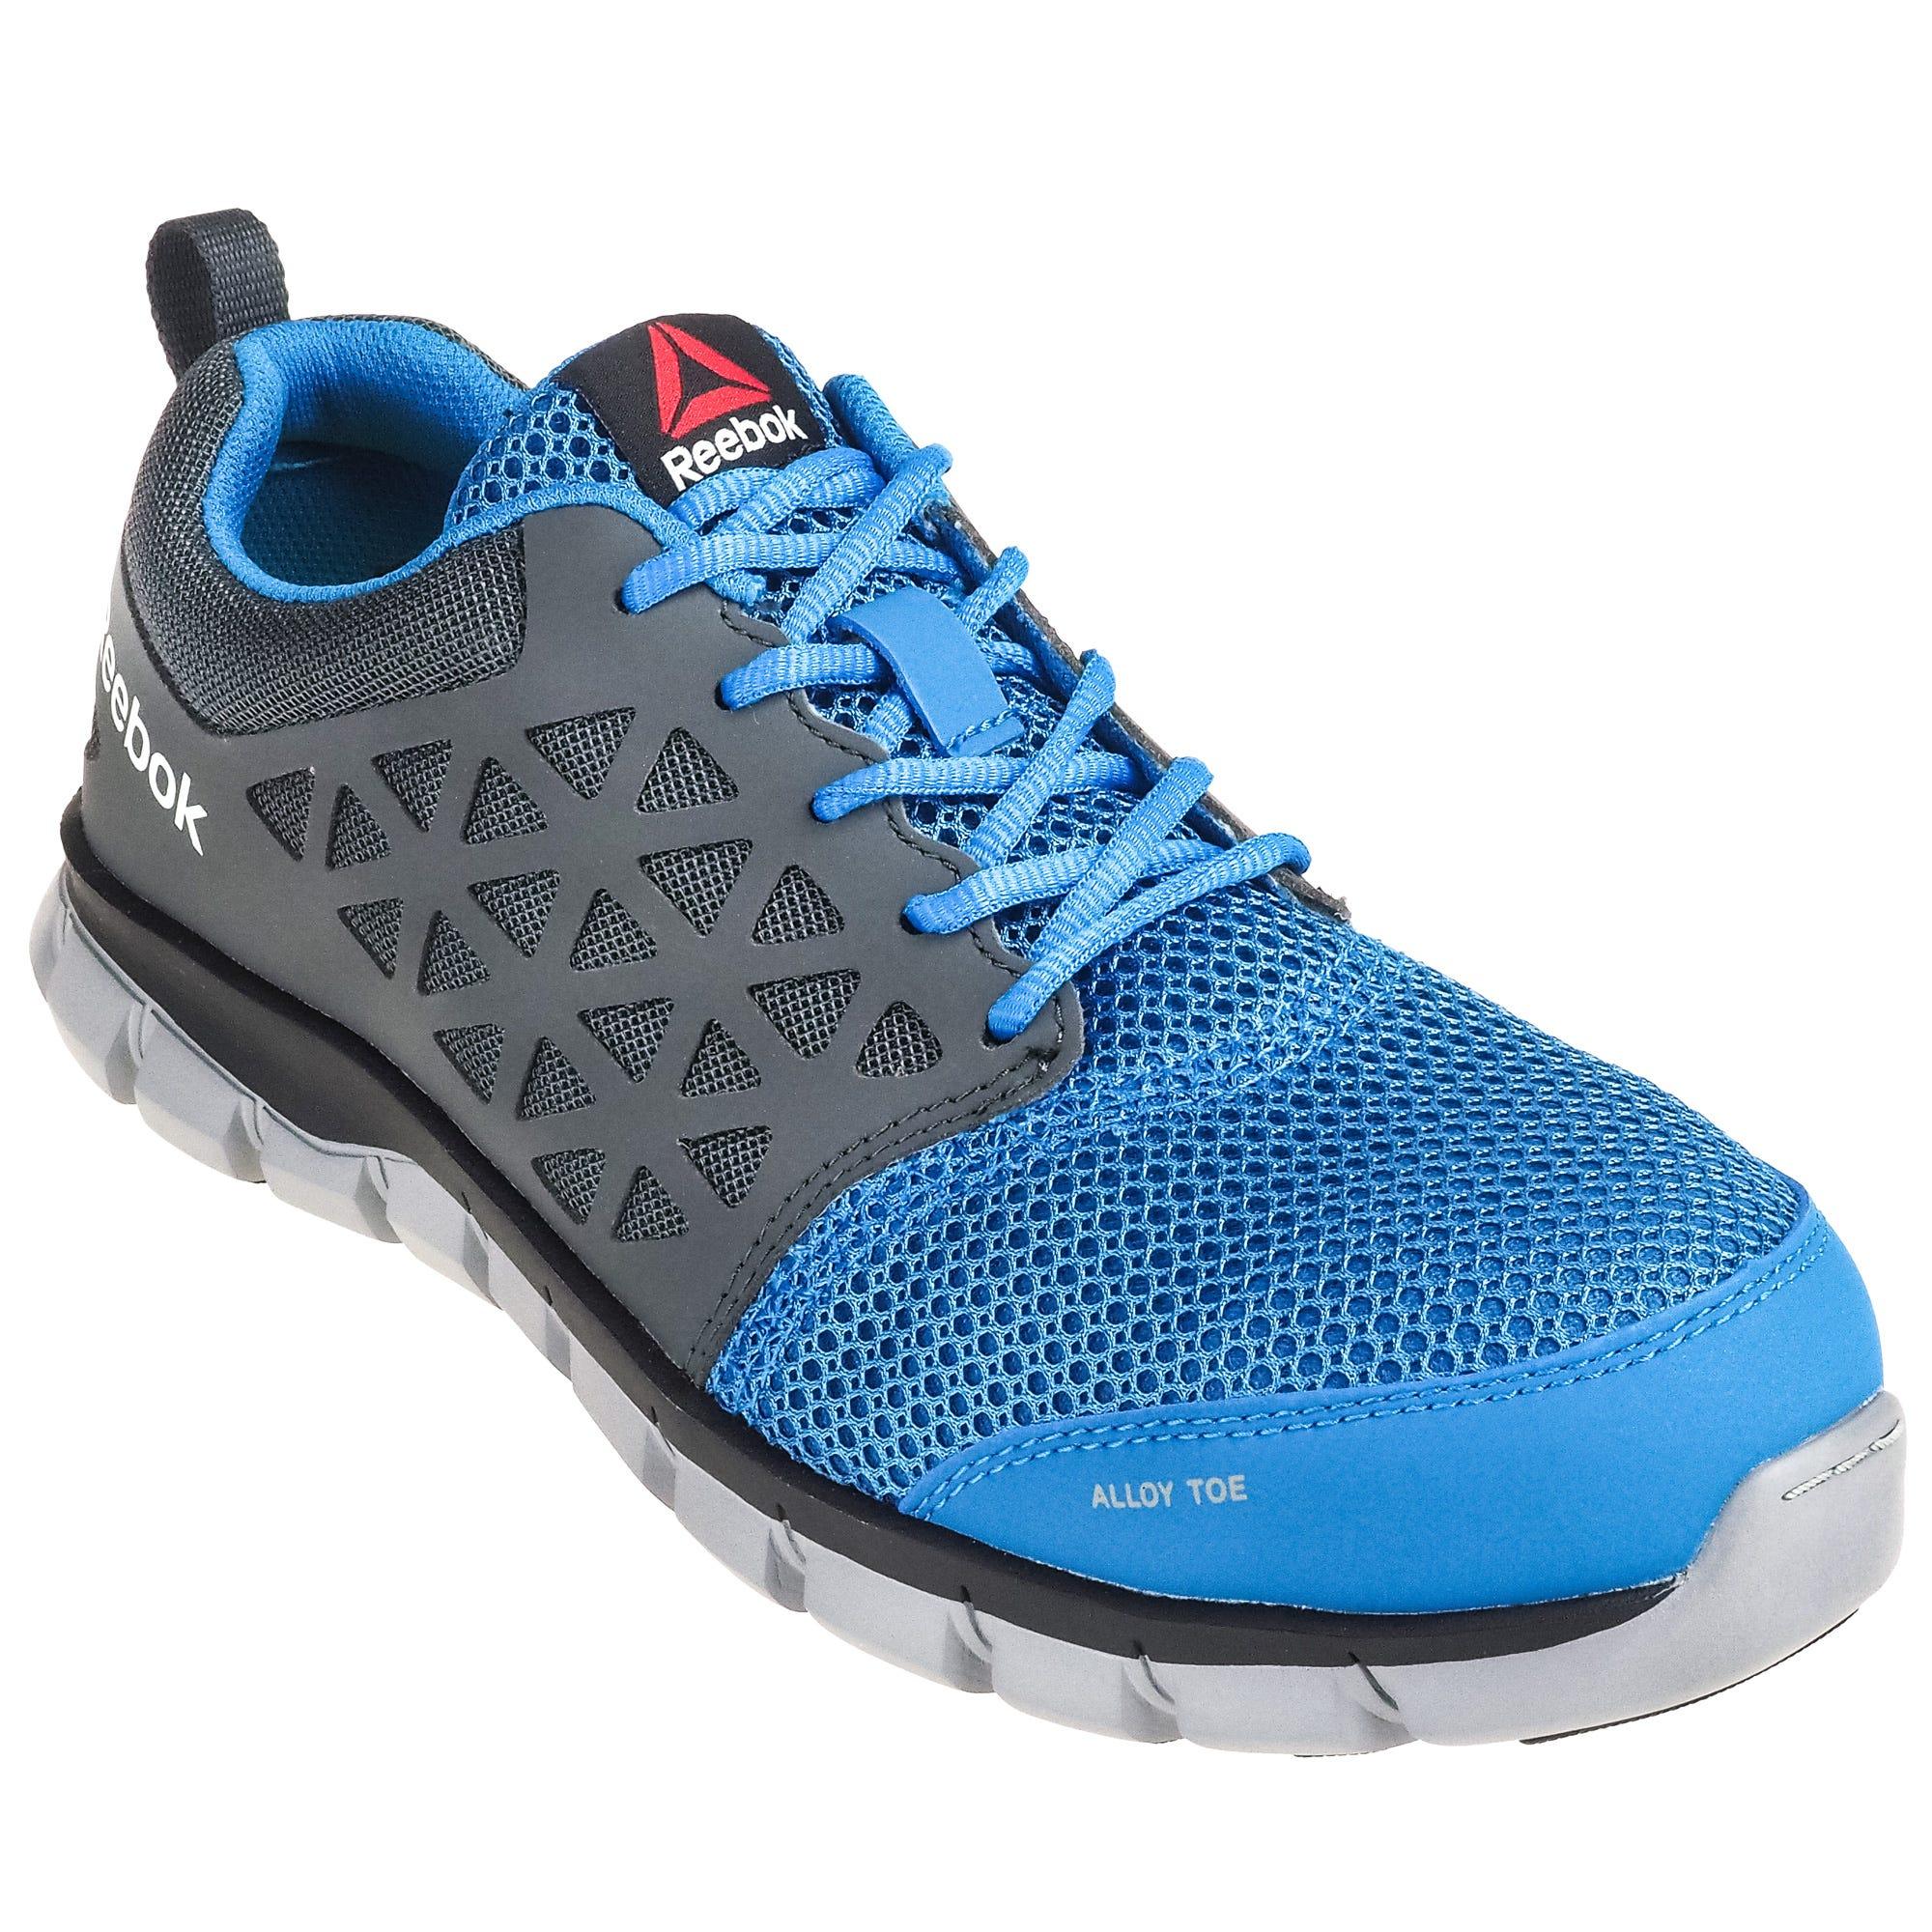 efa3b316c4ed Reebok Shoes  ESD Men s RB4040 Alloy Toe Blue Grey Sublite Cushion ...